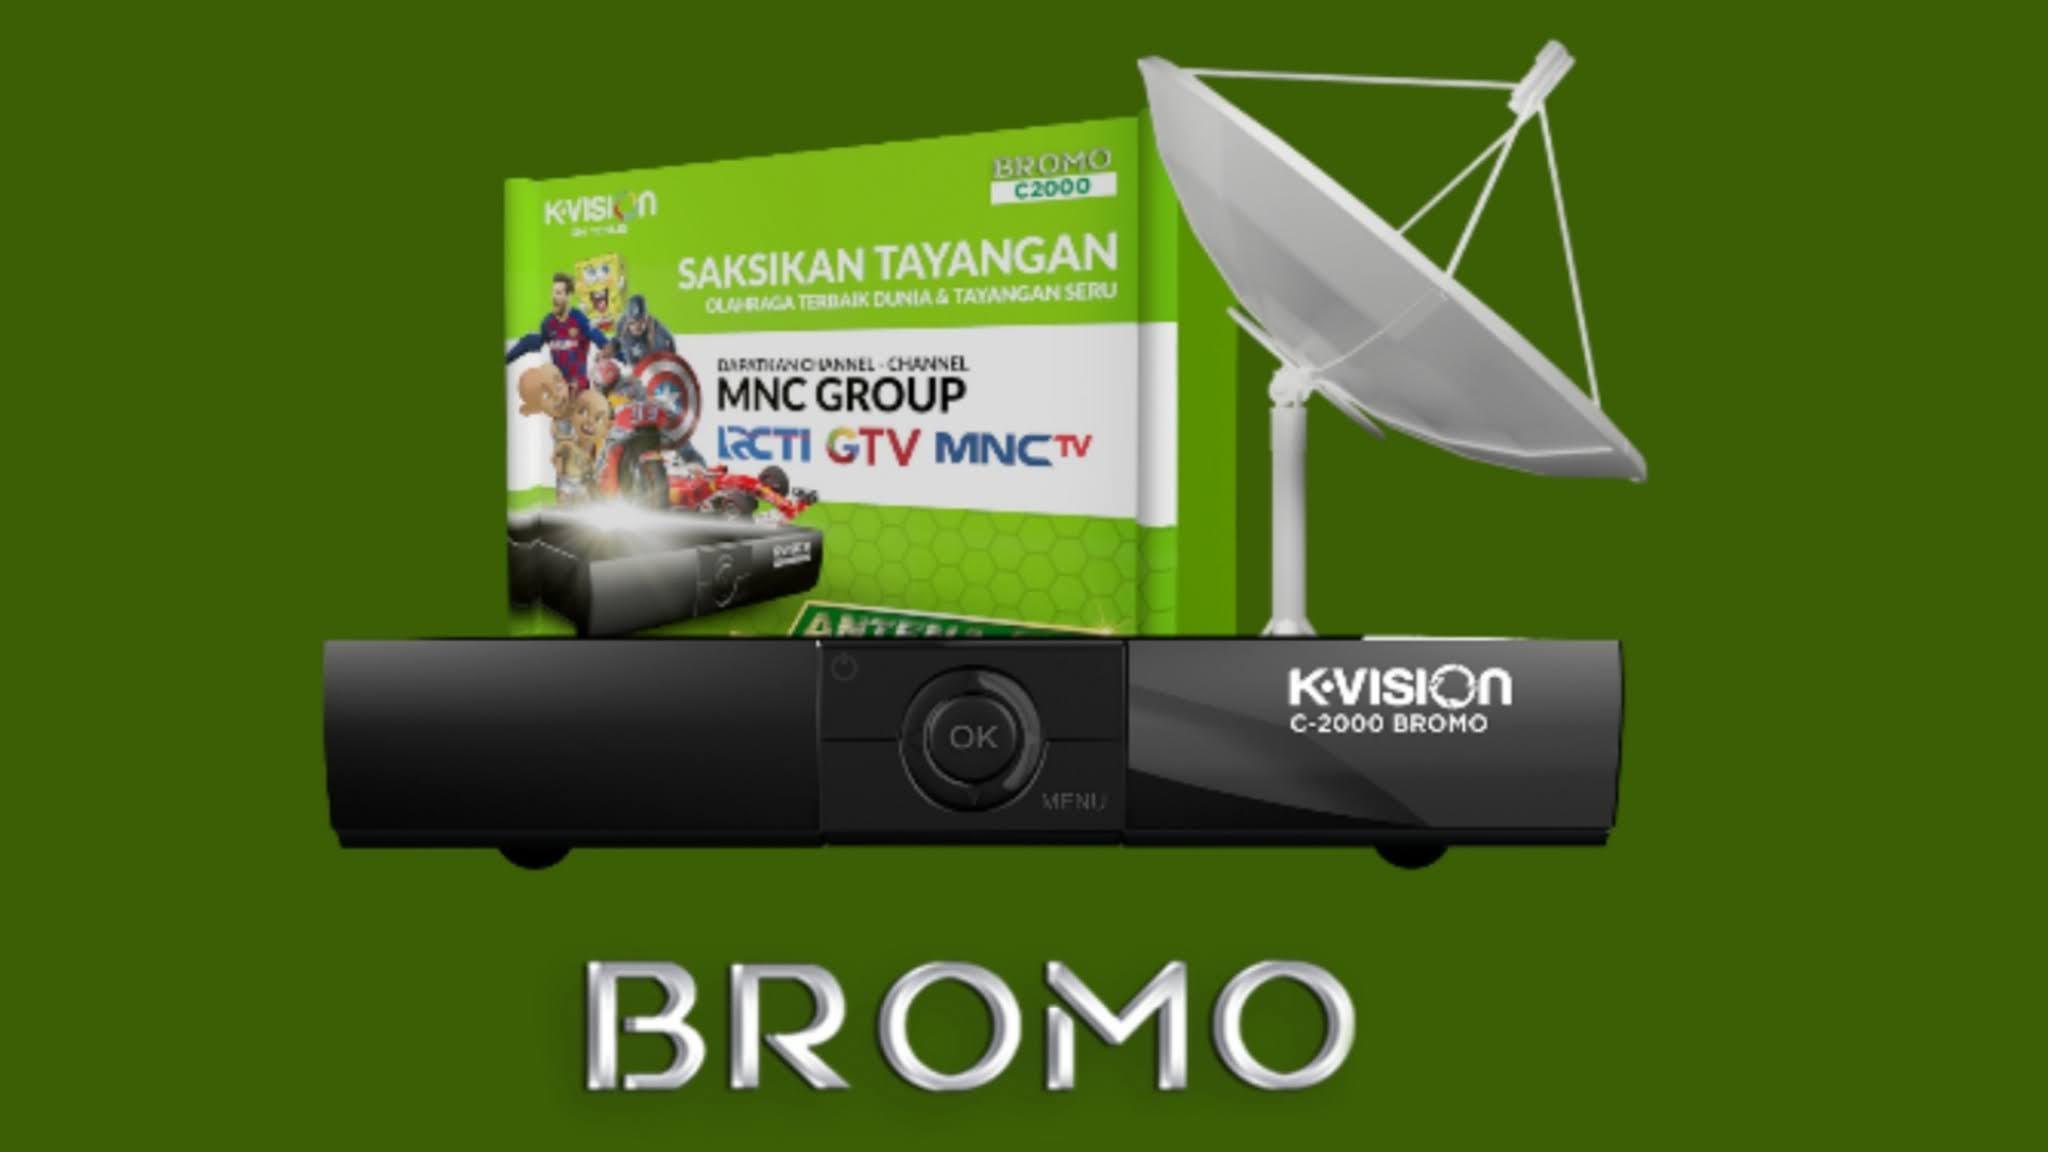 Kelebihan dan kekurangan kvision Bromo c2000 Terbaru 2020